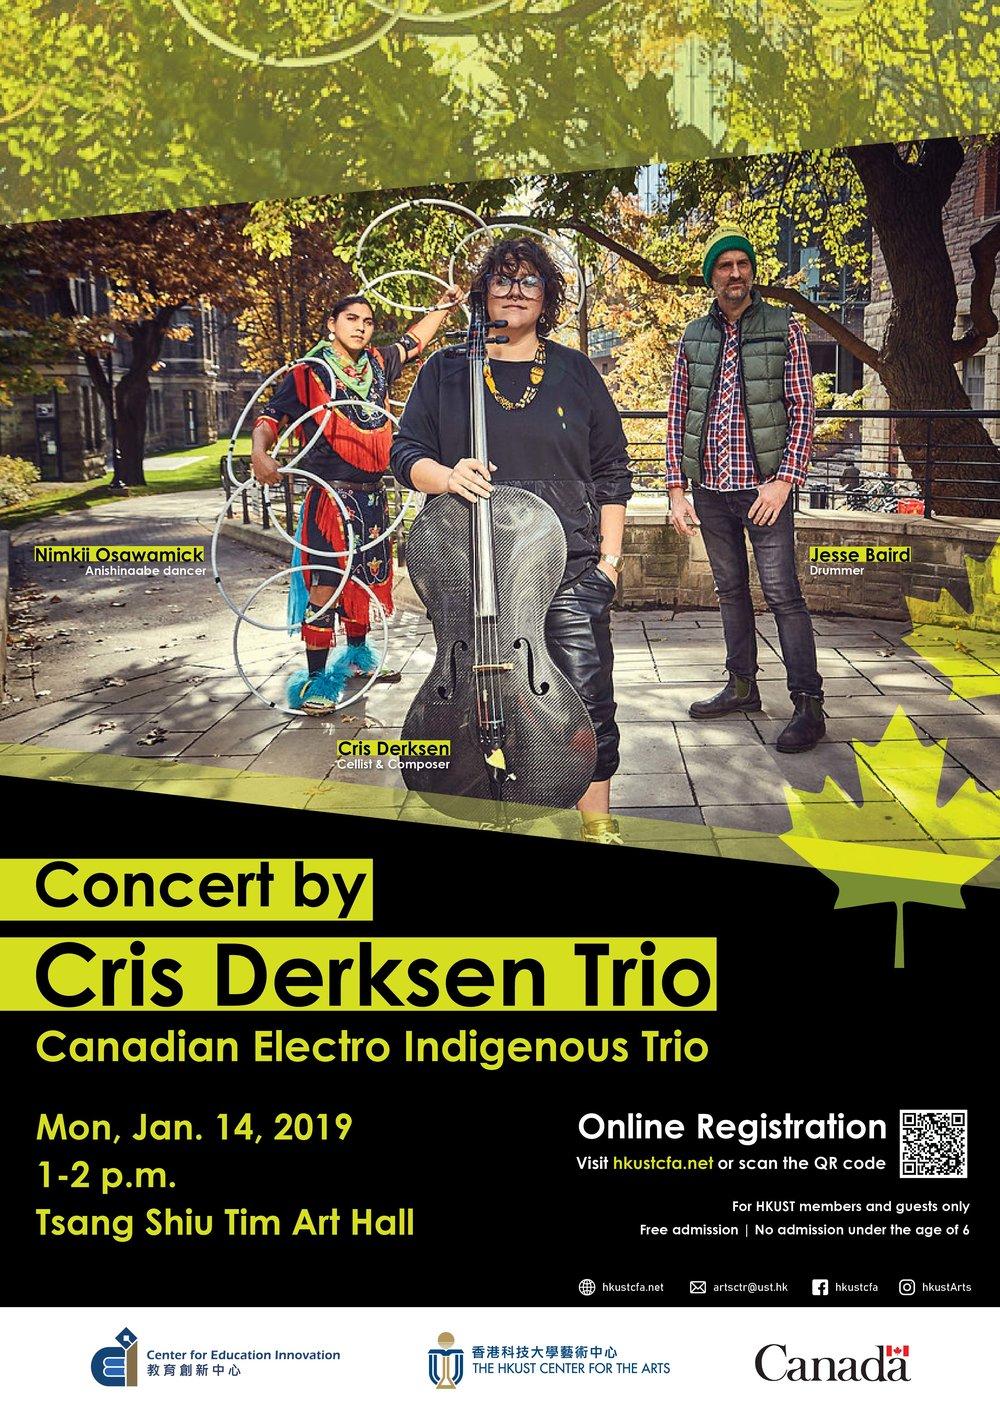 Poster_Concert by Cris Derksen Trio_20190114-01.jpg